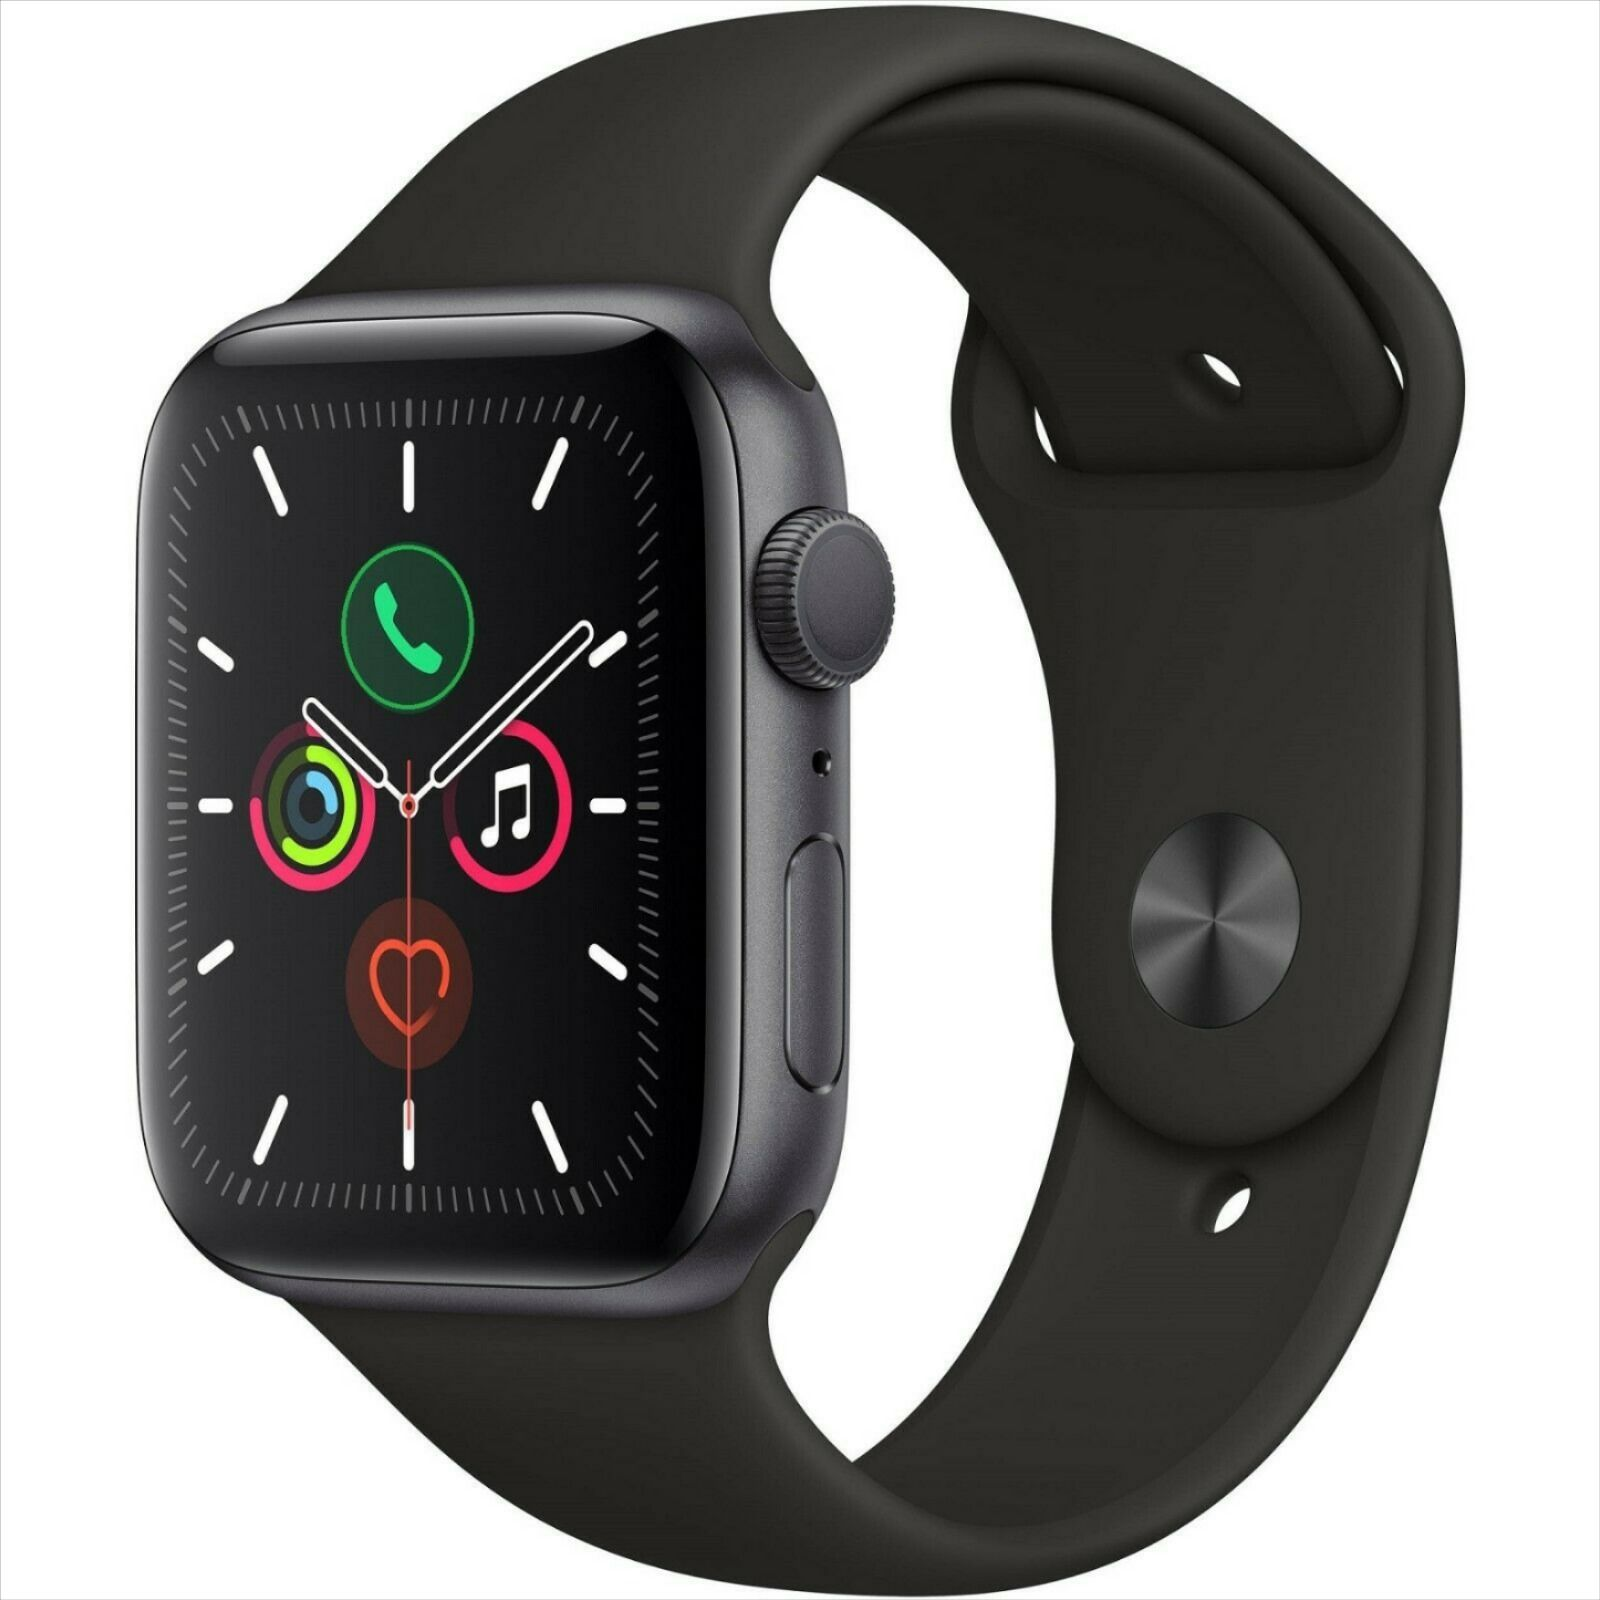 27+ Apple watch 5 golf gps ideas